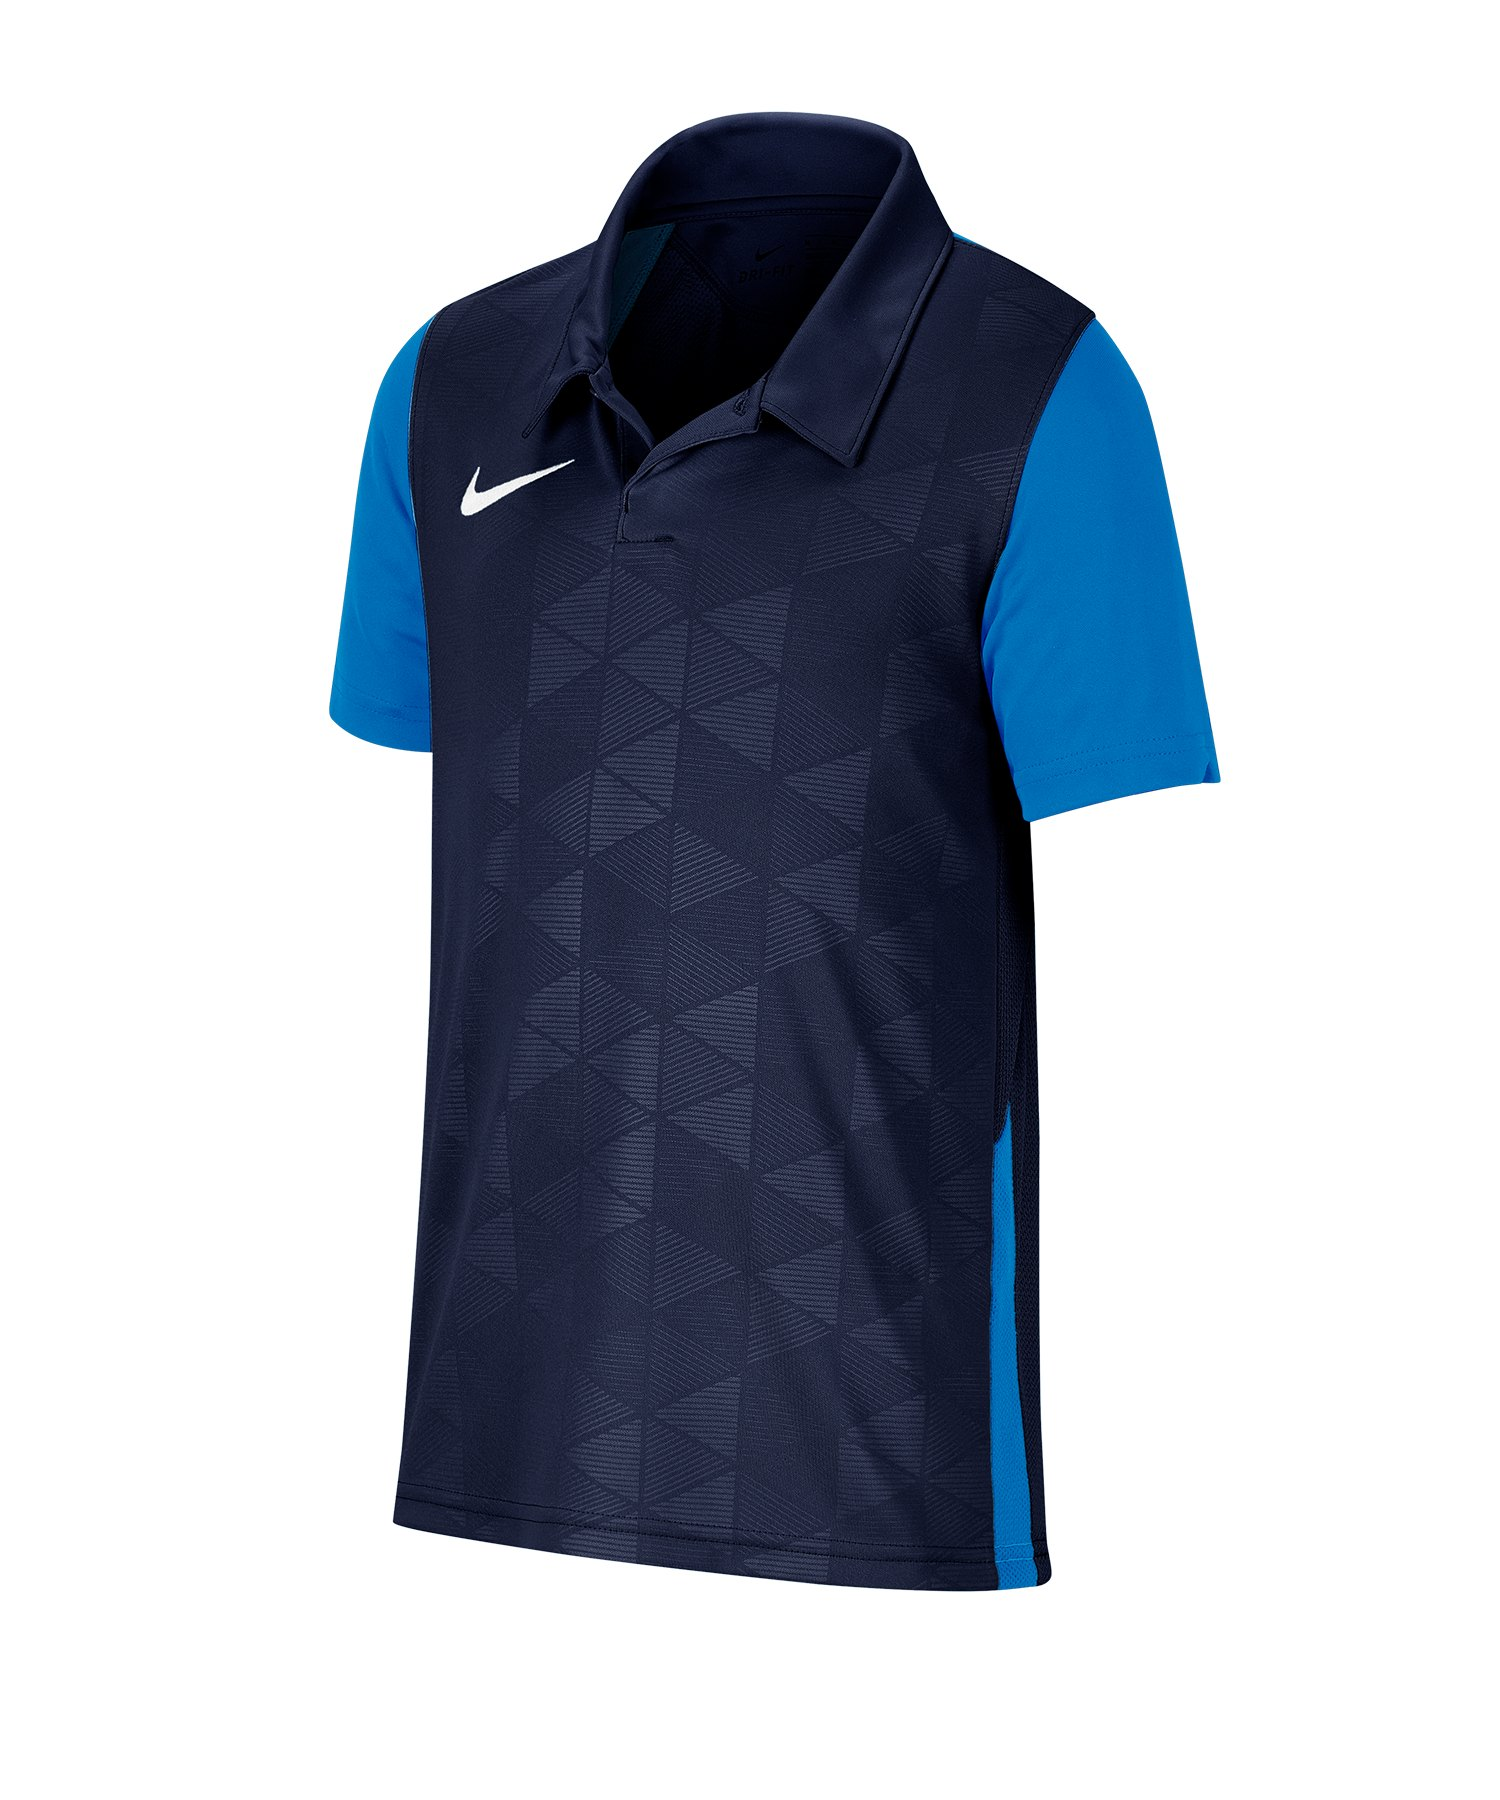 Nike Trophy IV Trikot kurzarm Kids Blau F410 - blau